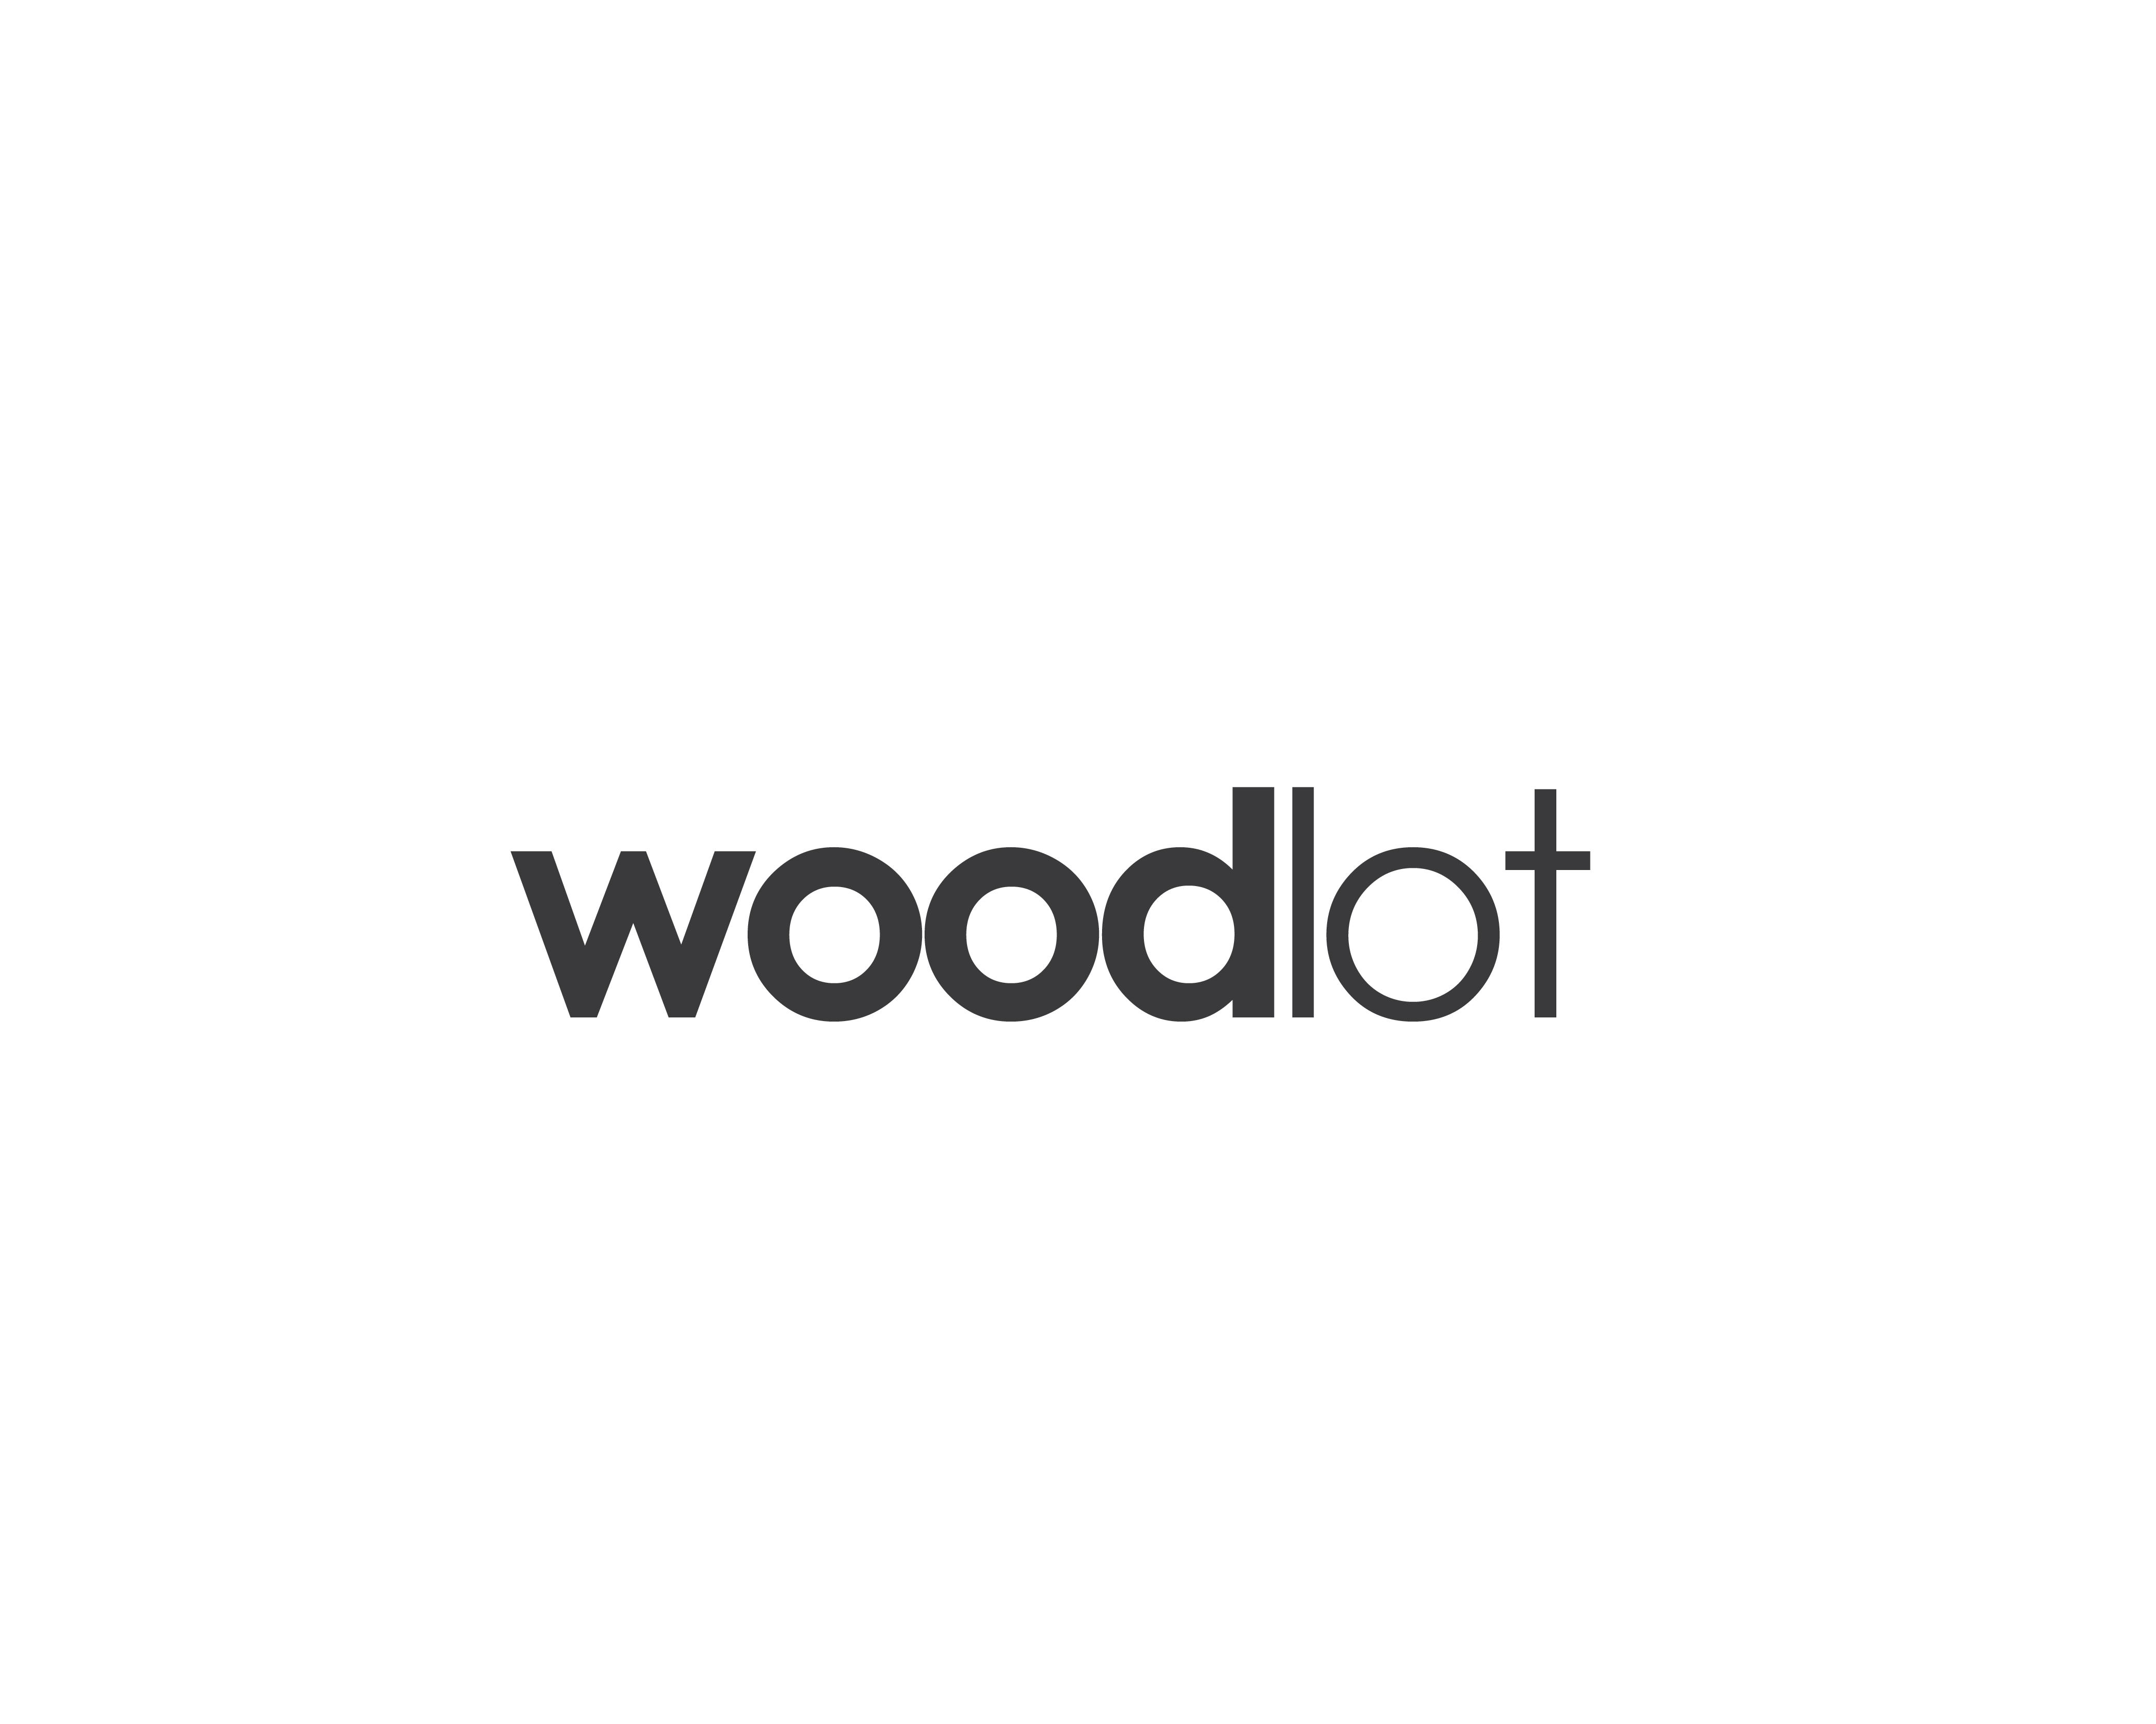 Logo Design by roc - Entry No. 48 in the Logo Design Contest Fun Logo Design for woodlot.